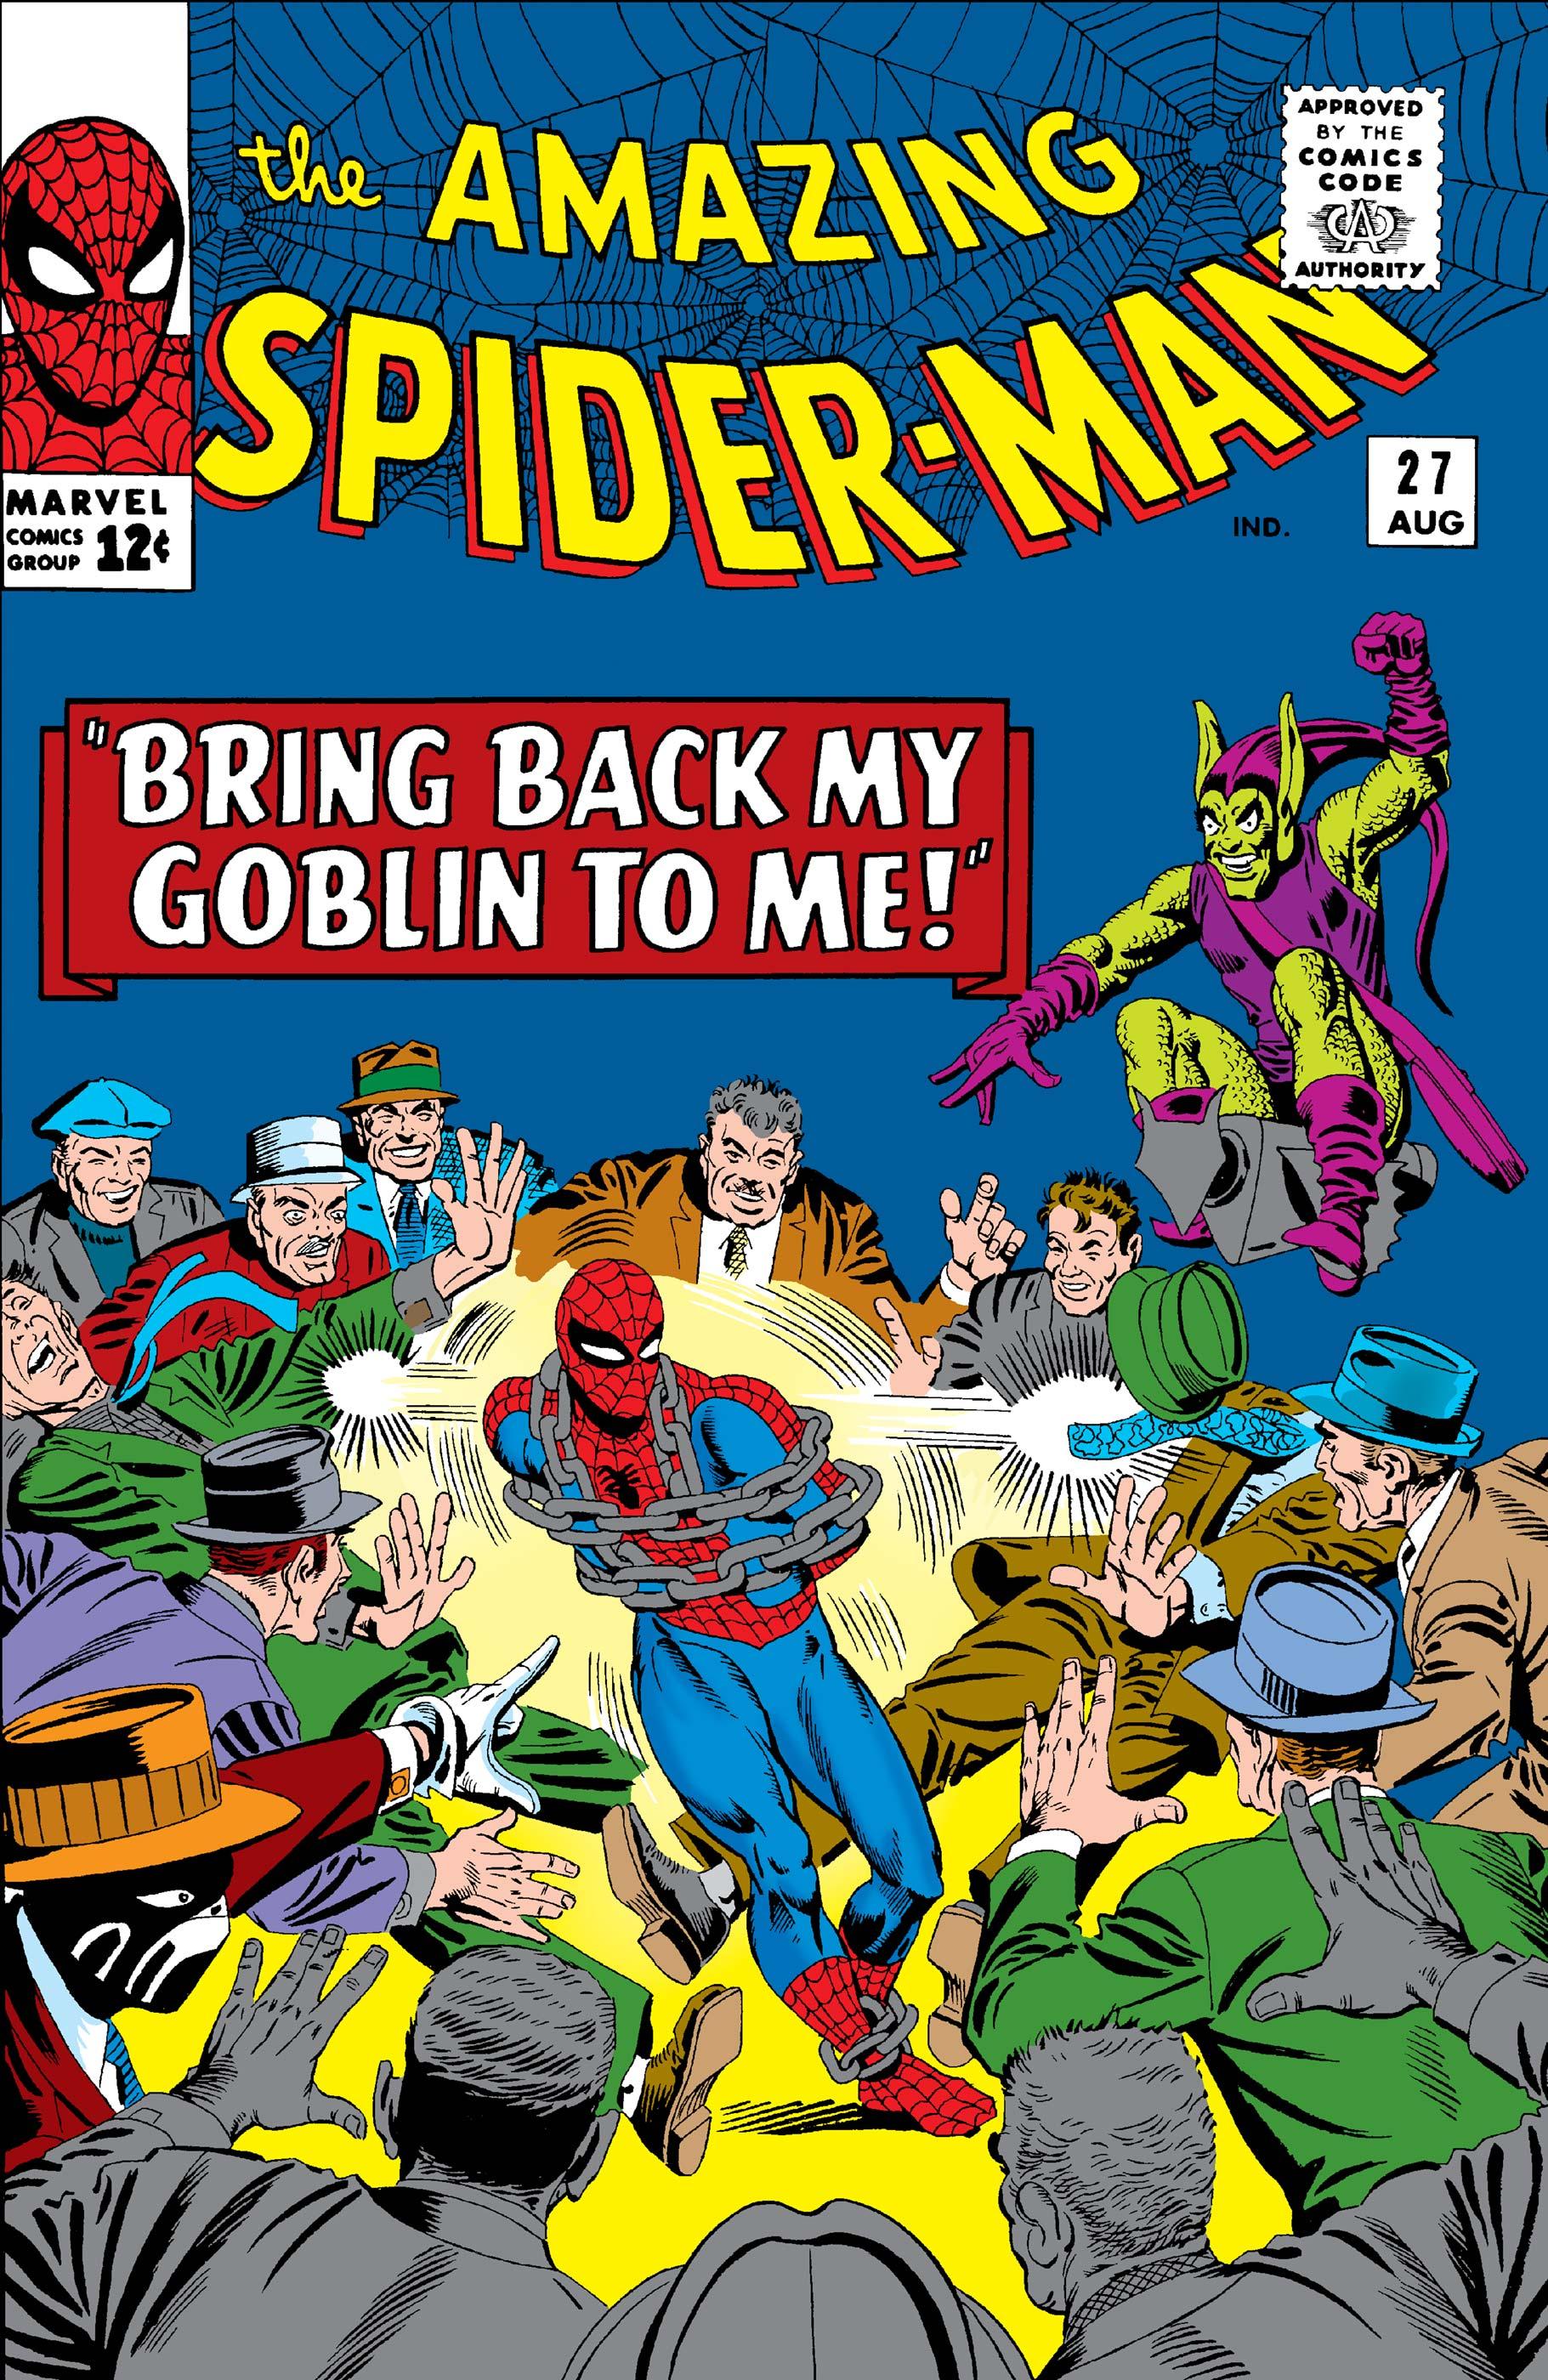 The Amazing Spider-Man (1963) #27